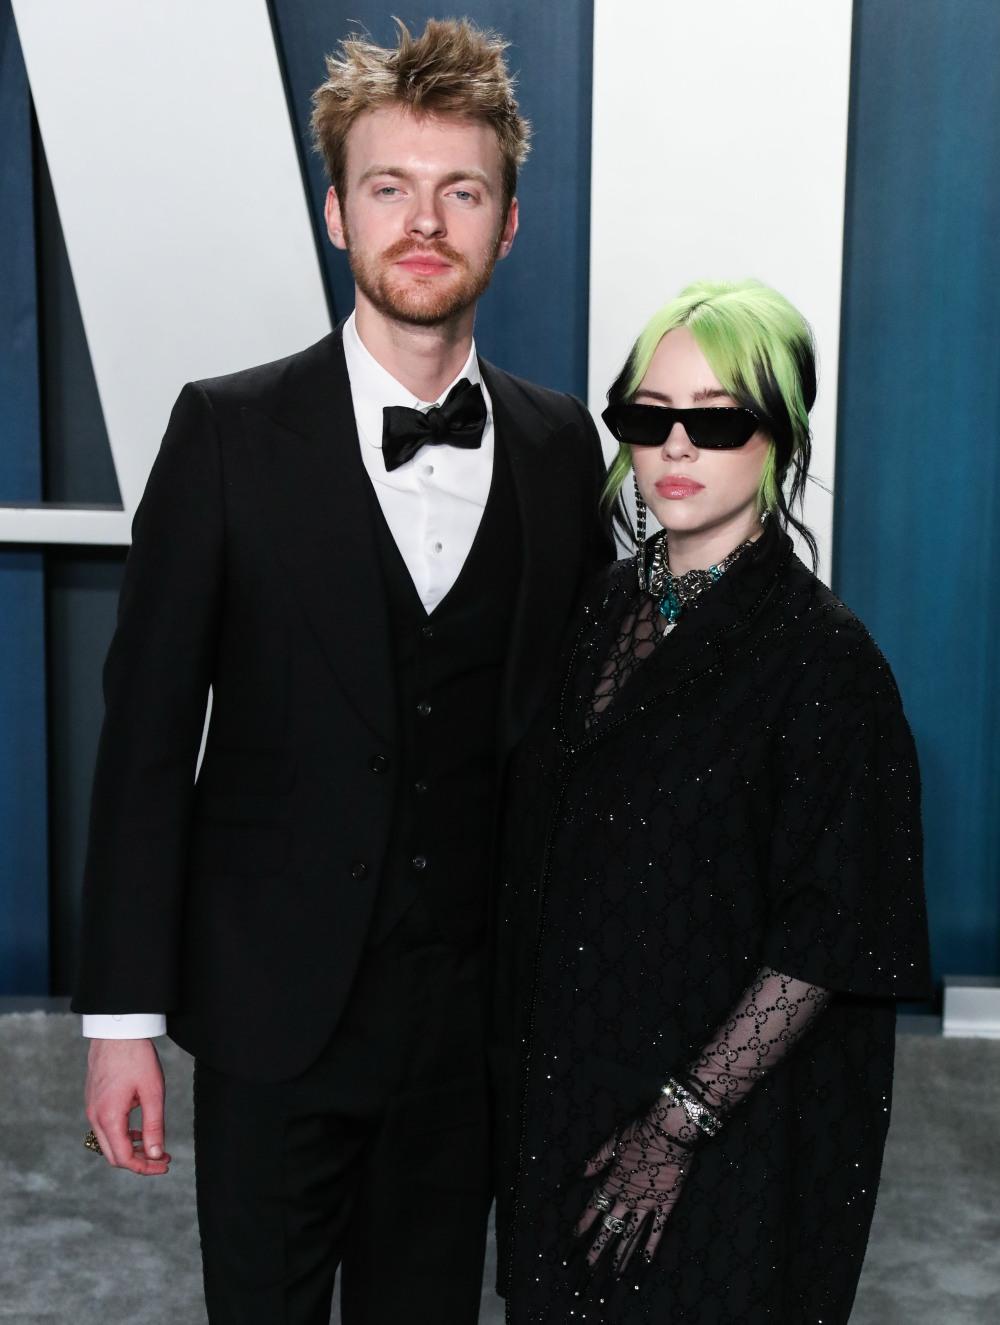 Finneas O'Connell and Billie Eilish arrive at the 2020 Vanity Fair Oscar Party held at the Wallis An...